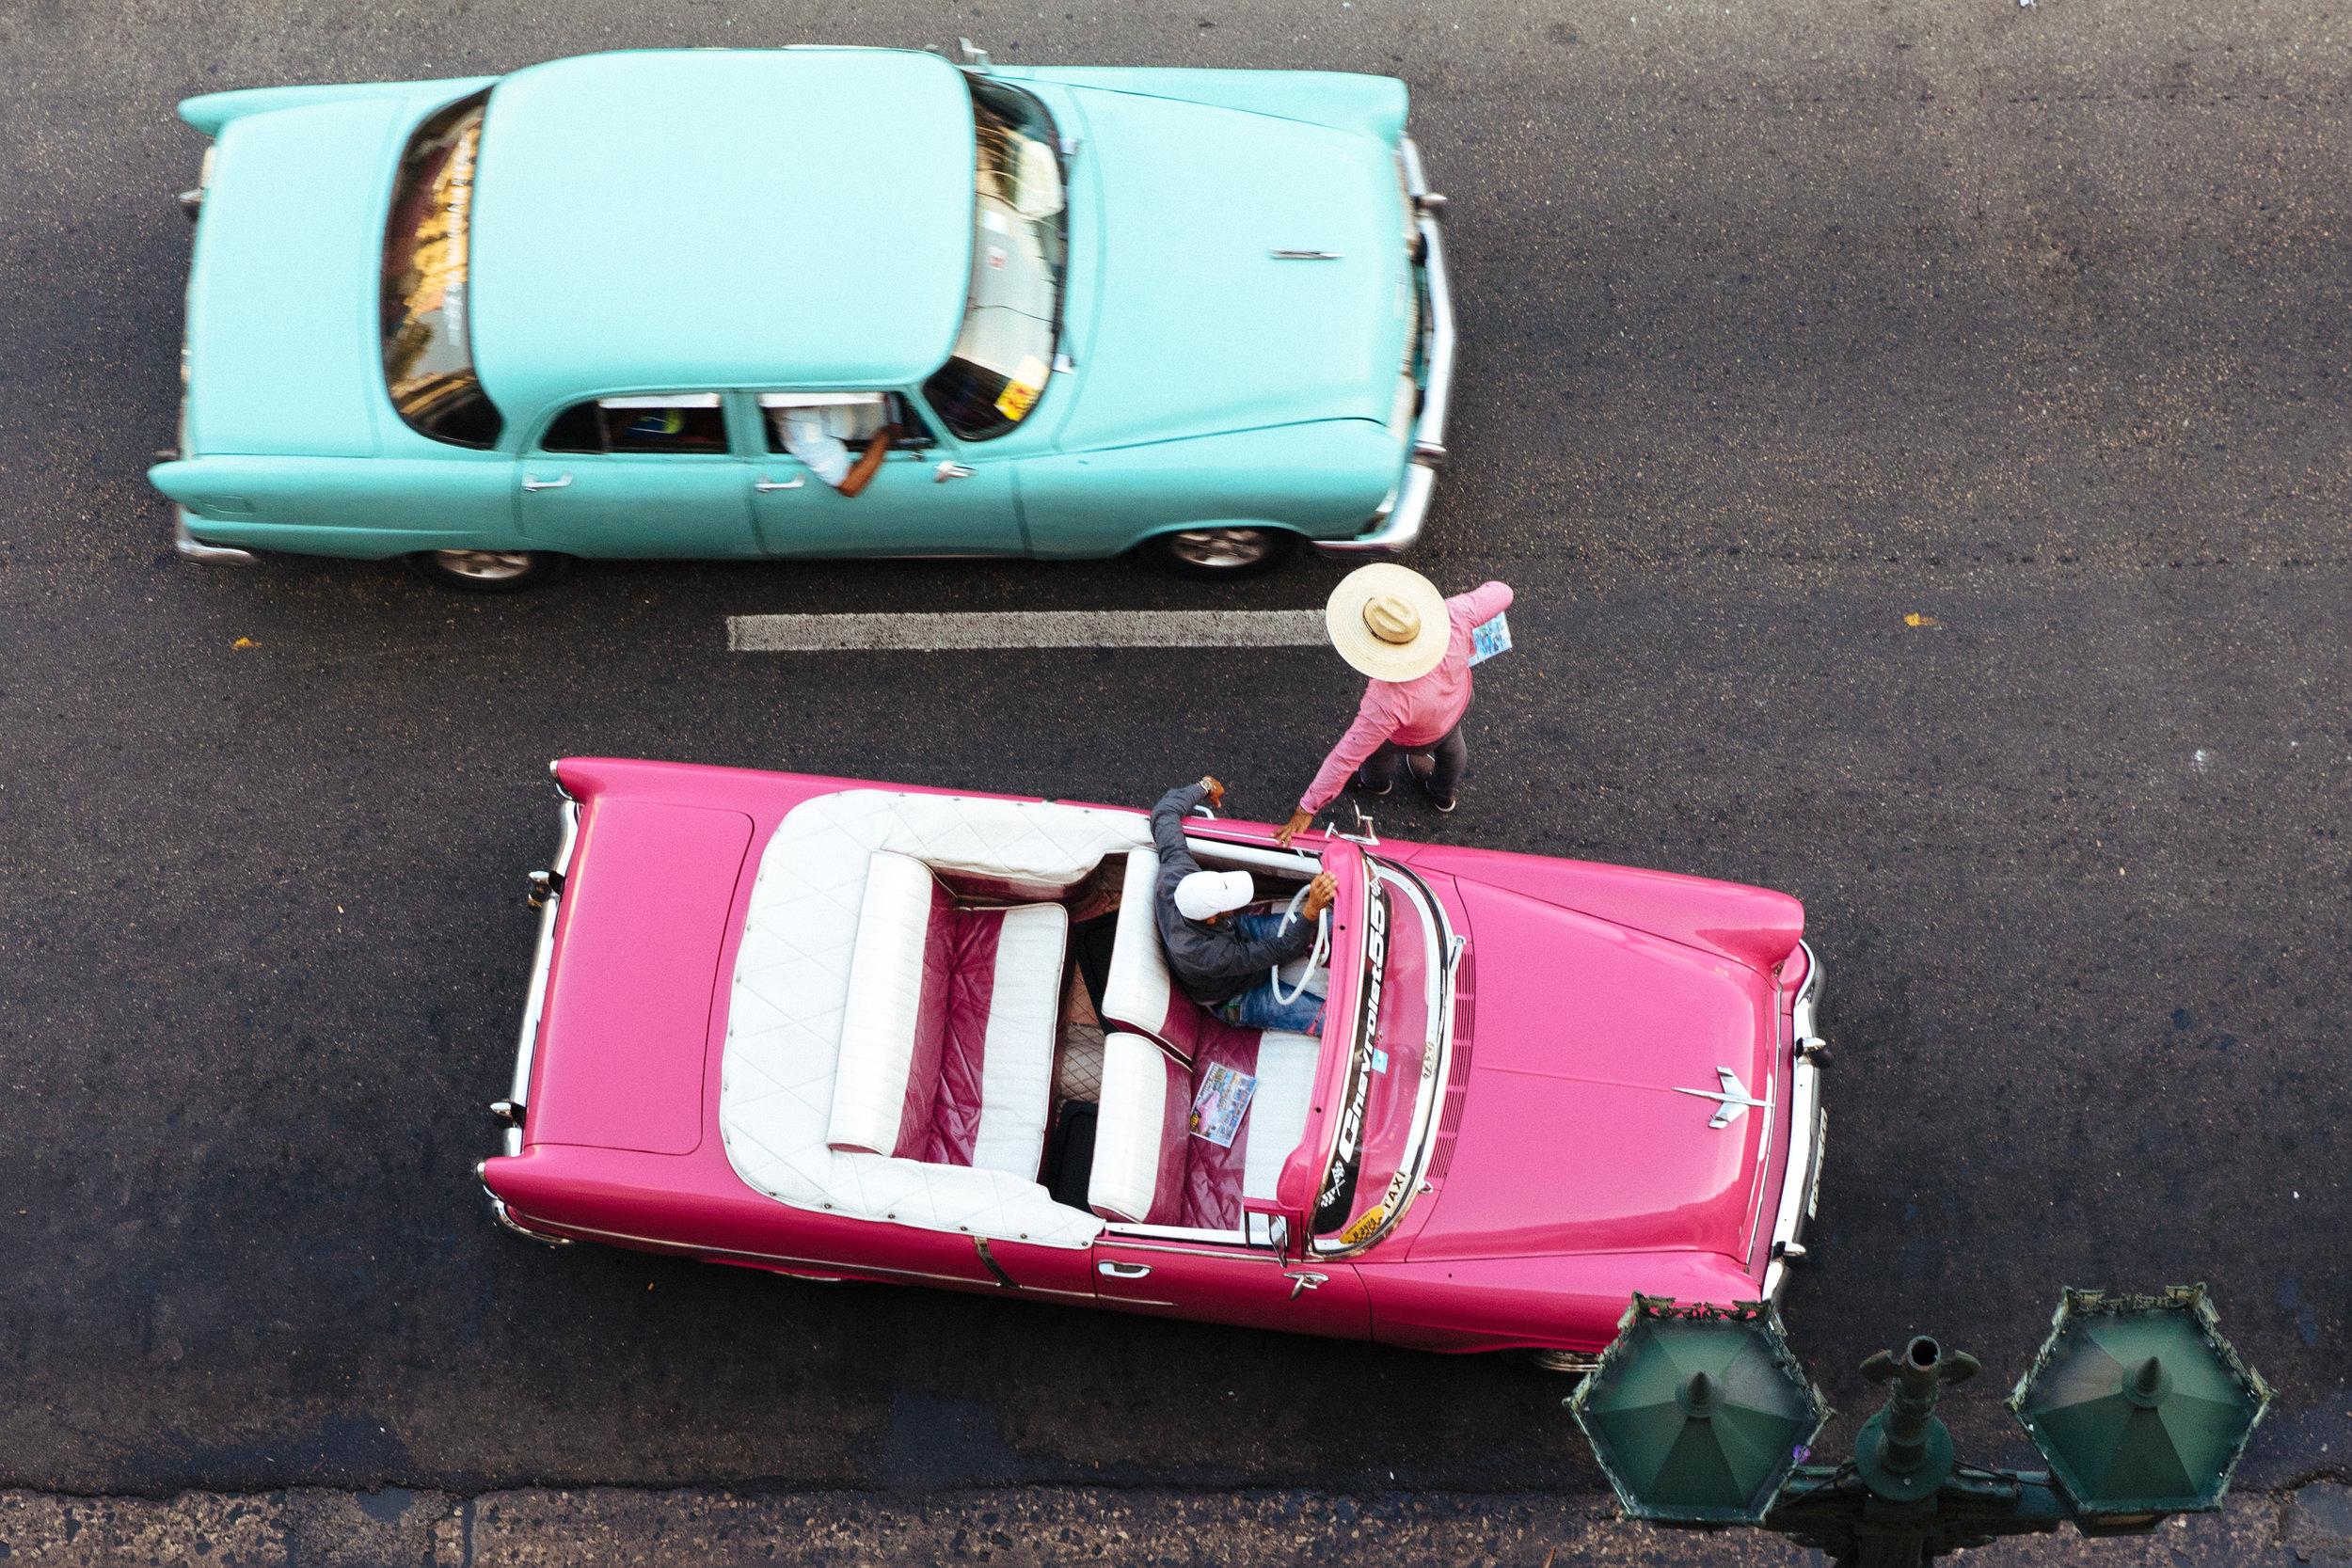 071217-Simone-Anne-Cuba-El-Camino-Travel-129 (1).jpg